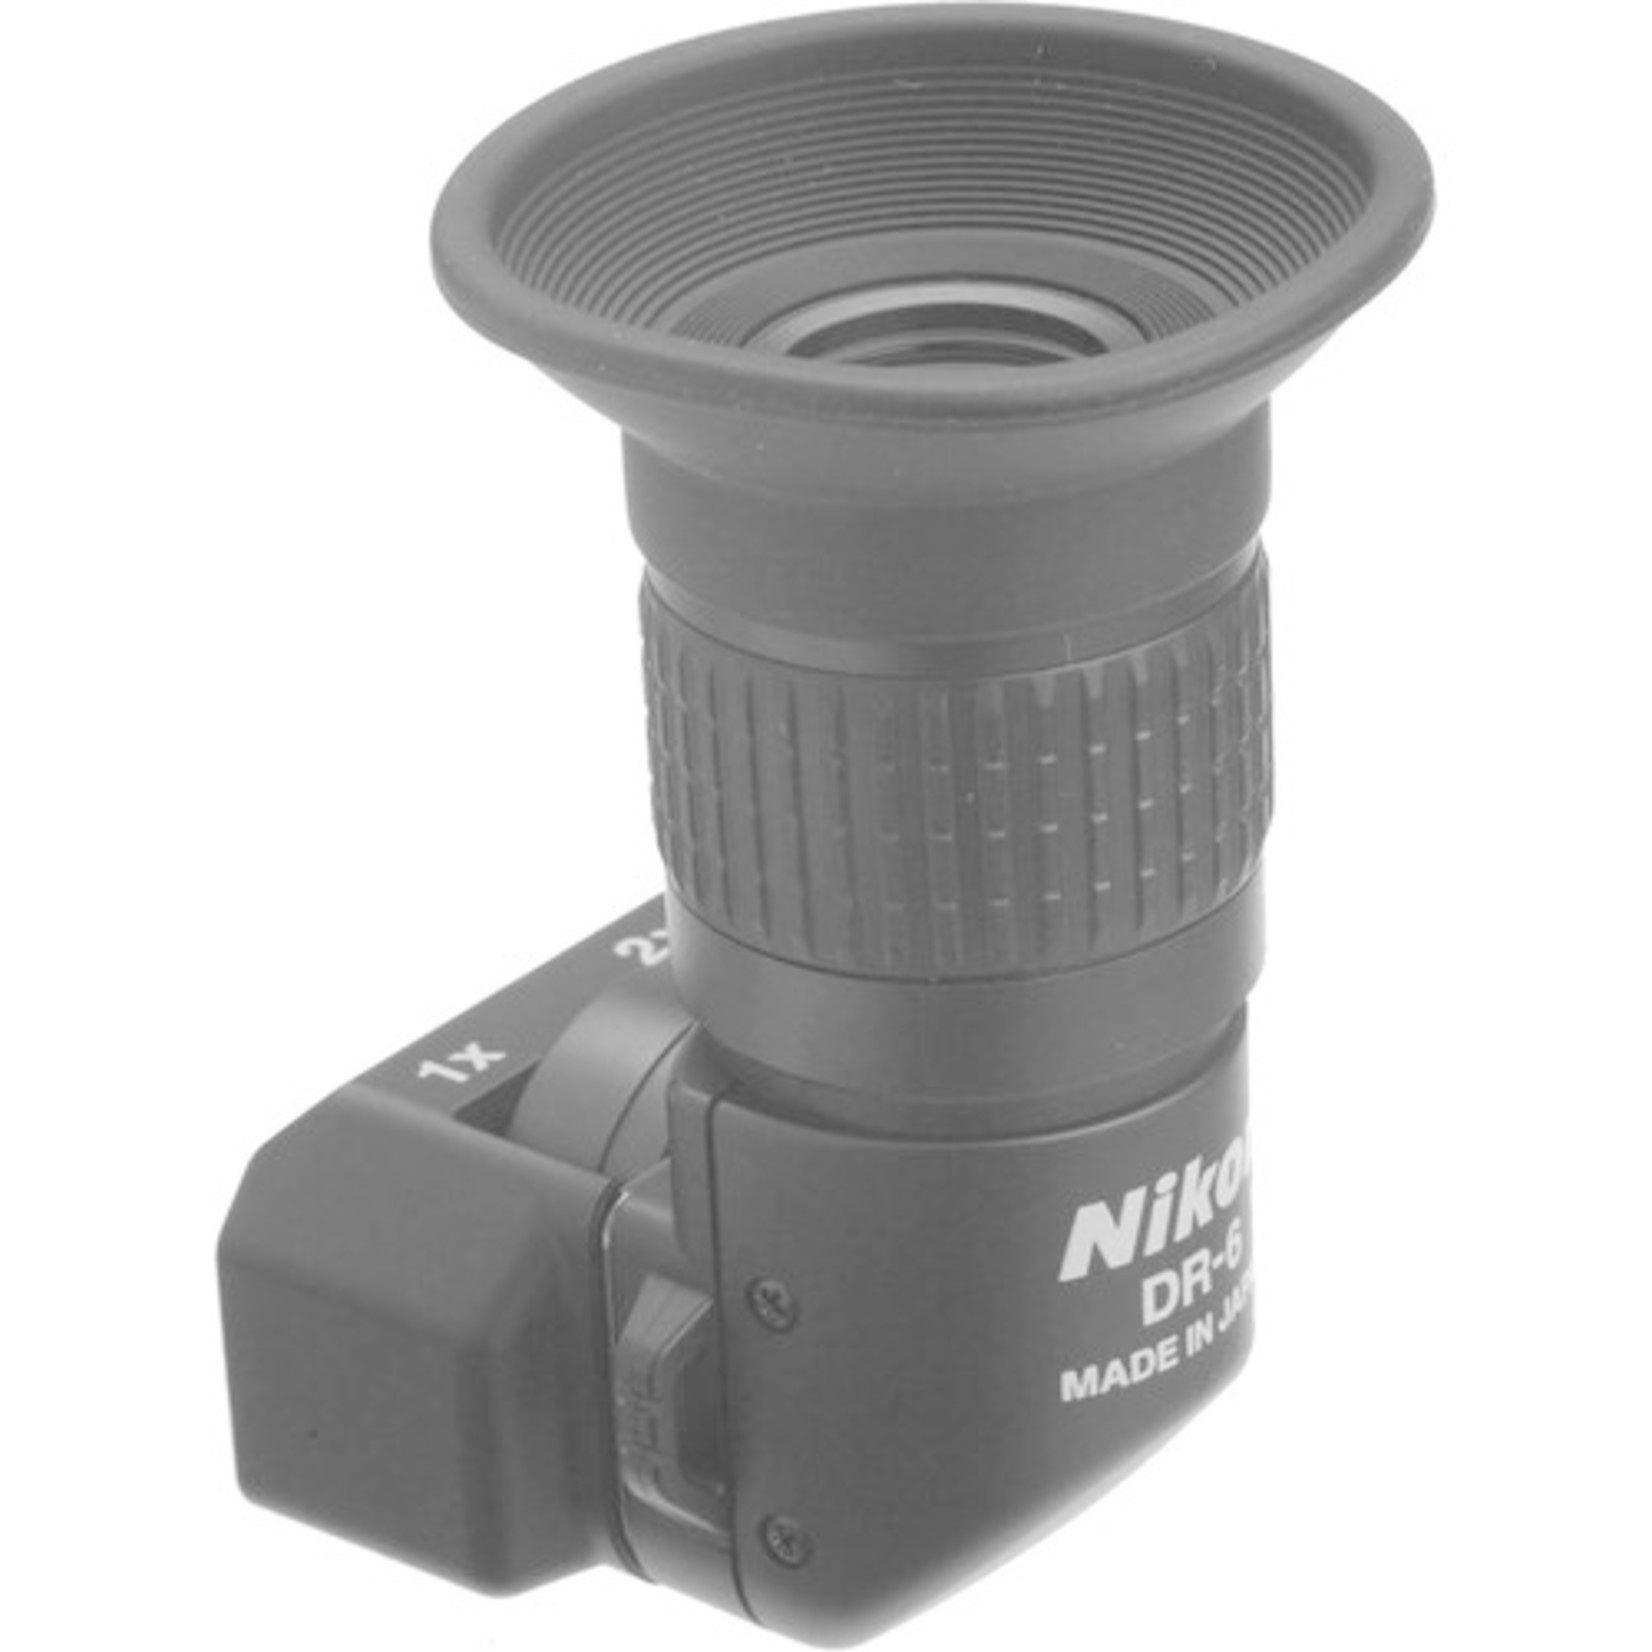 Nikon Nikon DR-6 Rectangular Right Angle Viewfinder